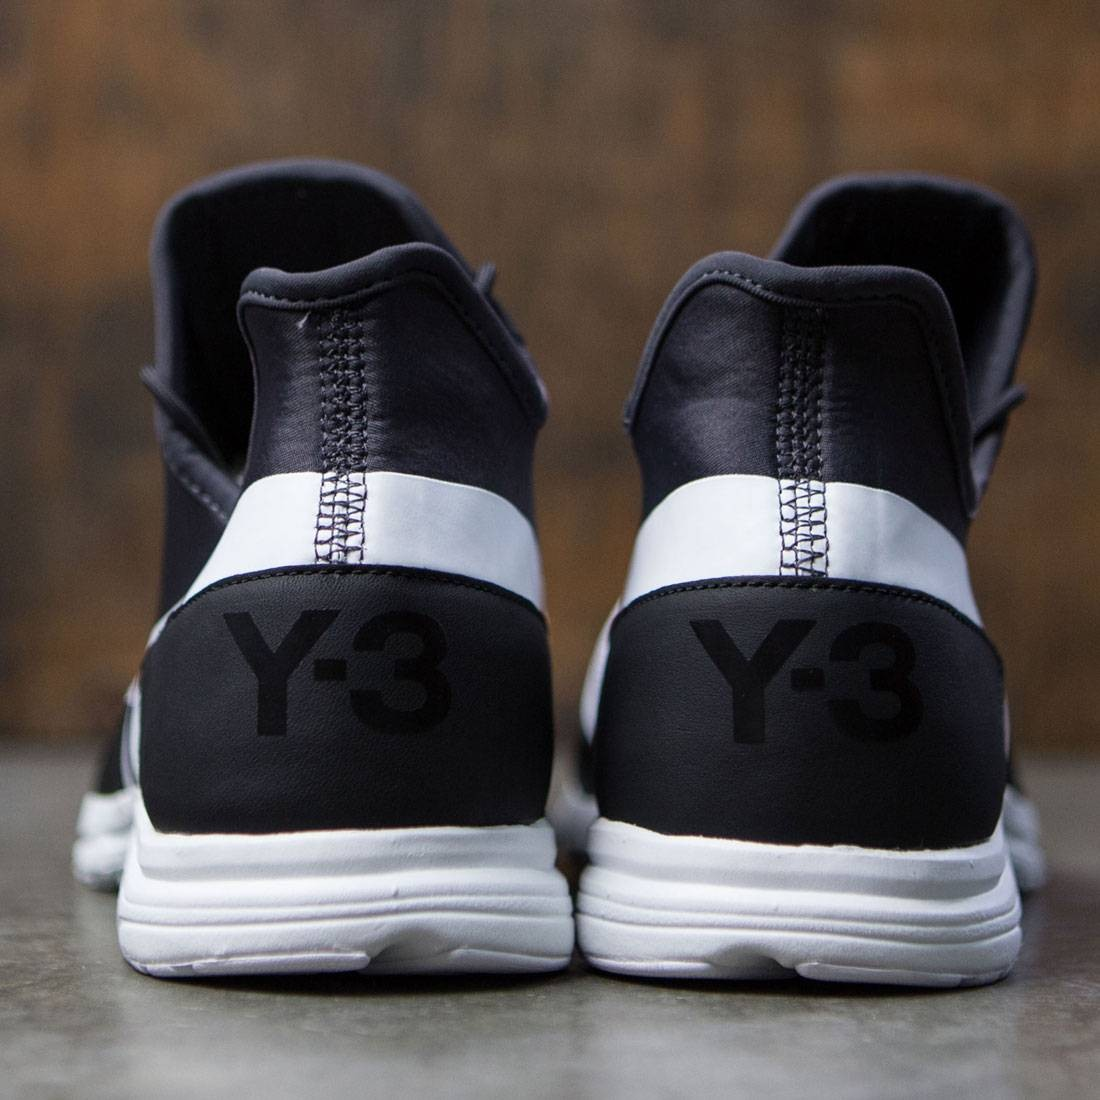 Adidas Y-3 Men Arc RC white utility black core black S77210